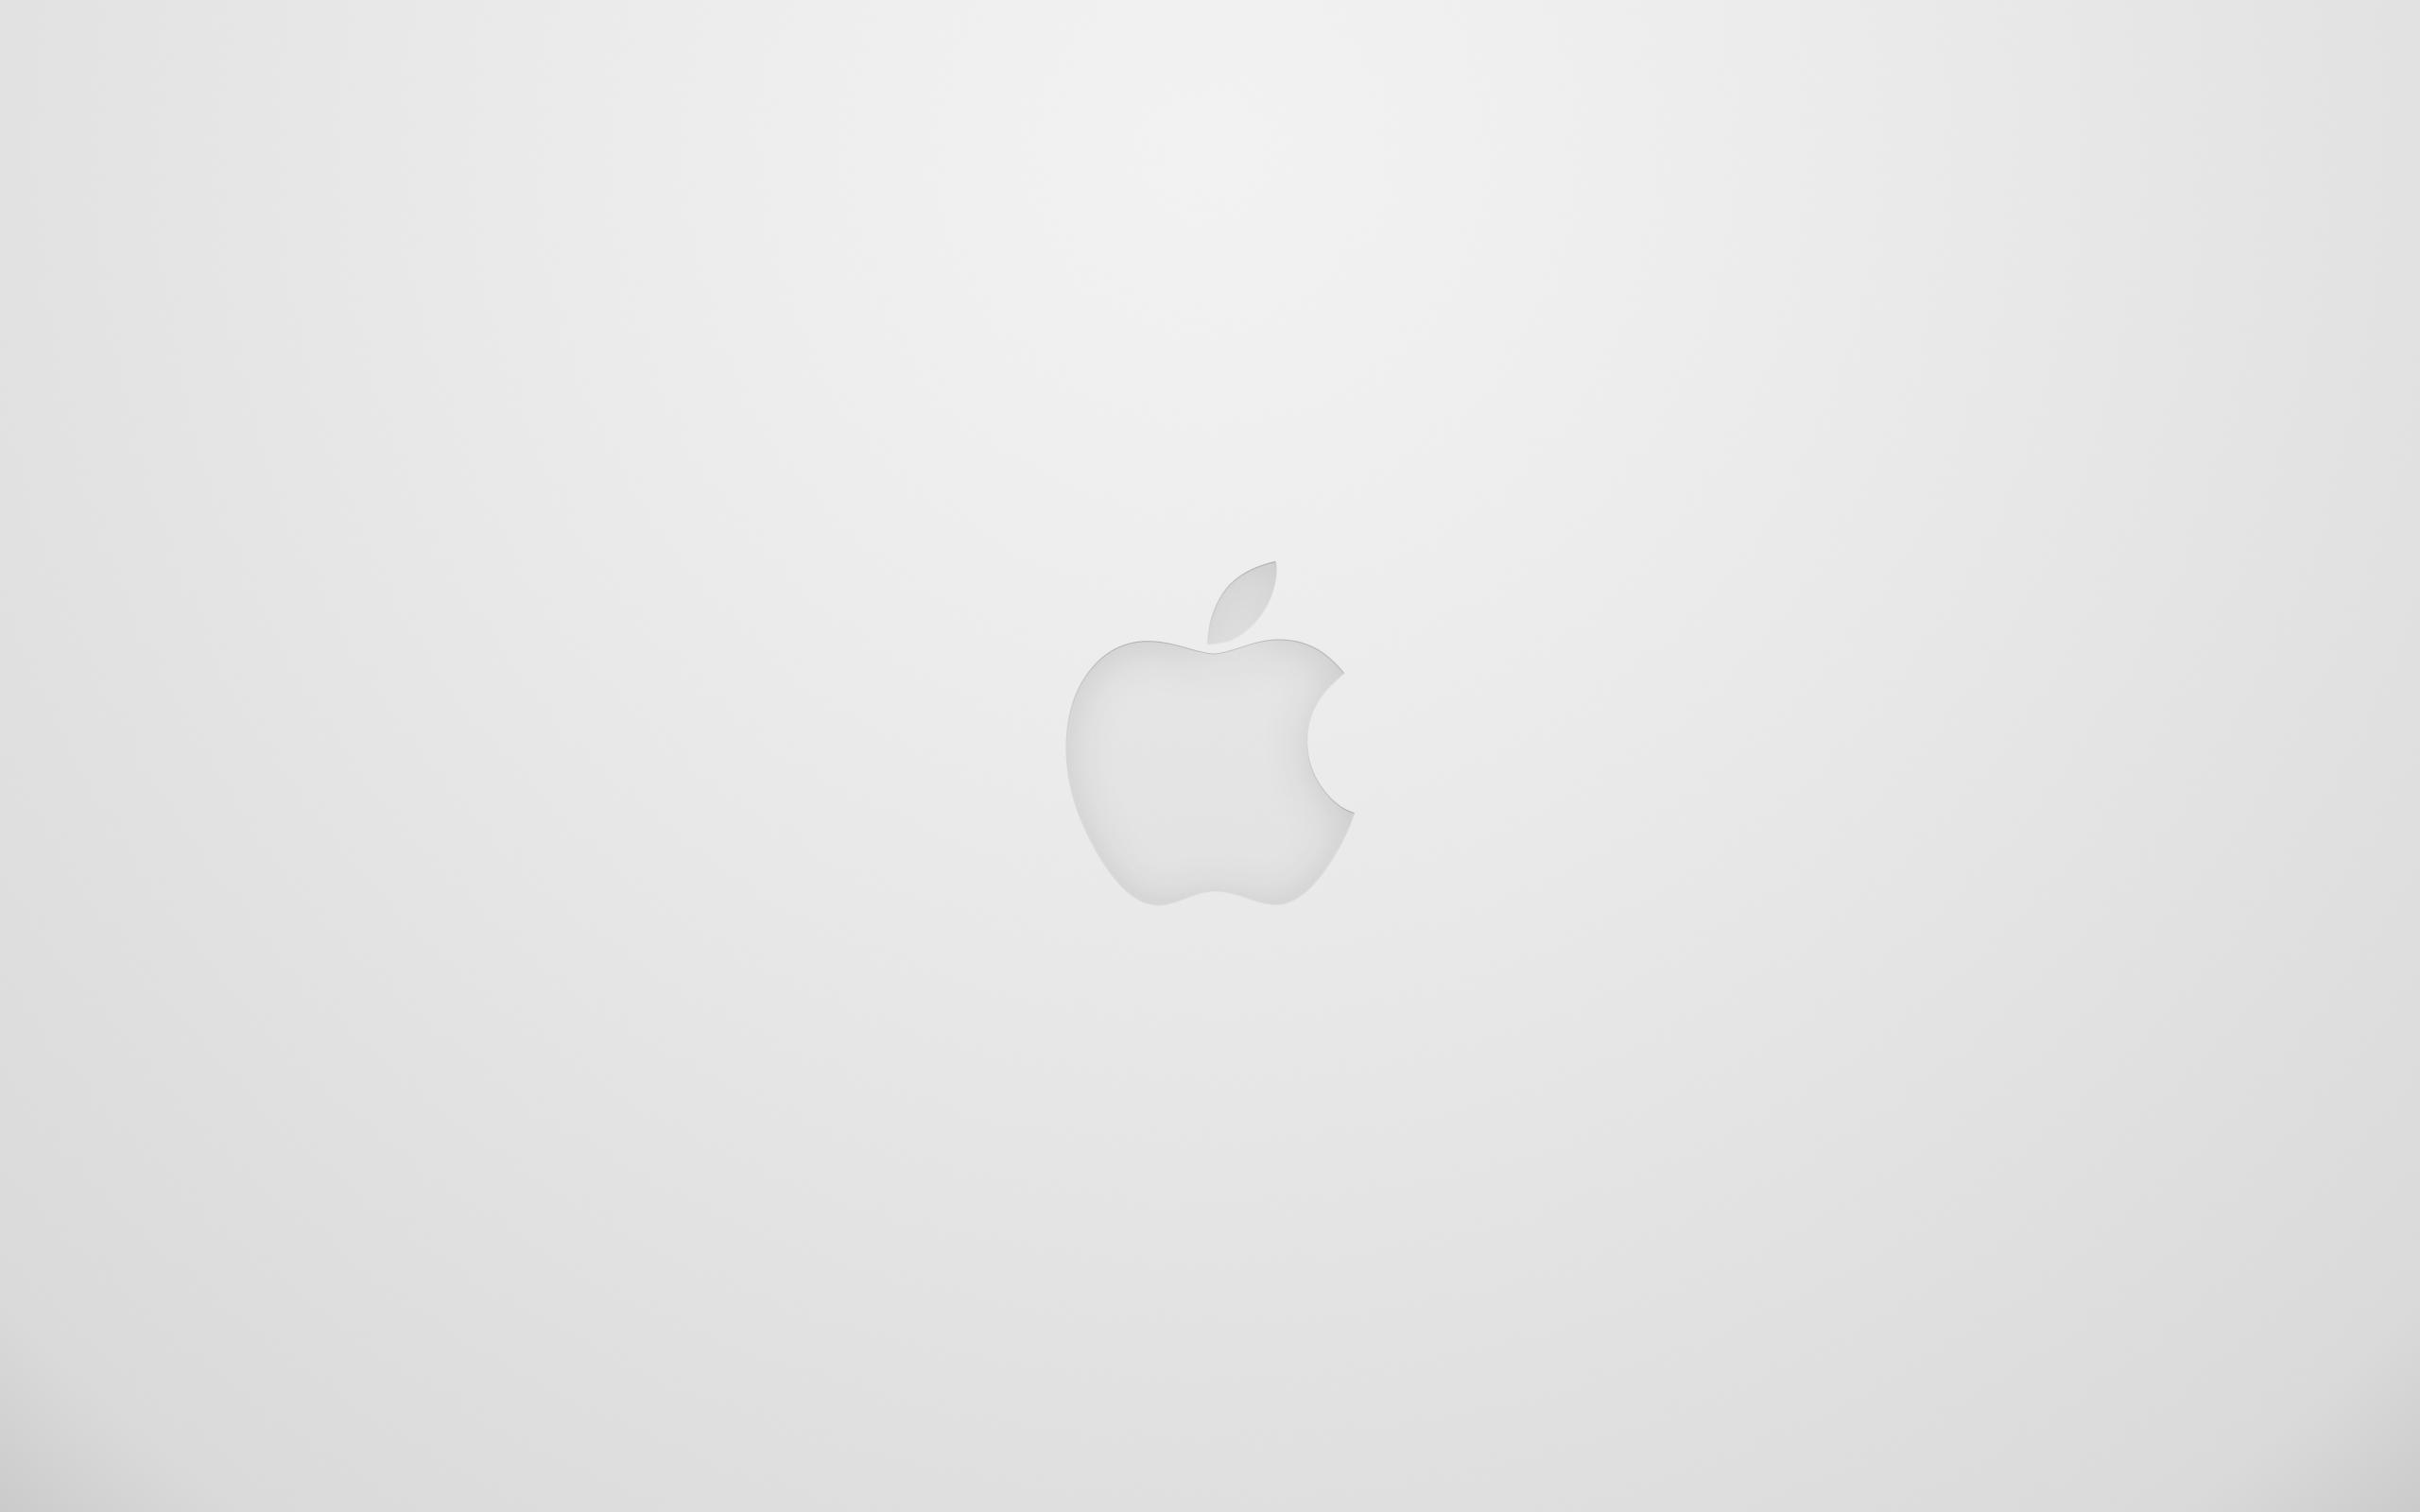 Apple Mac Light Logo